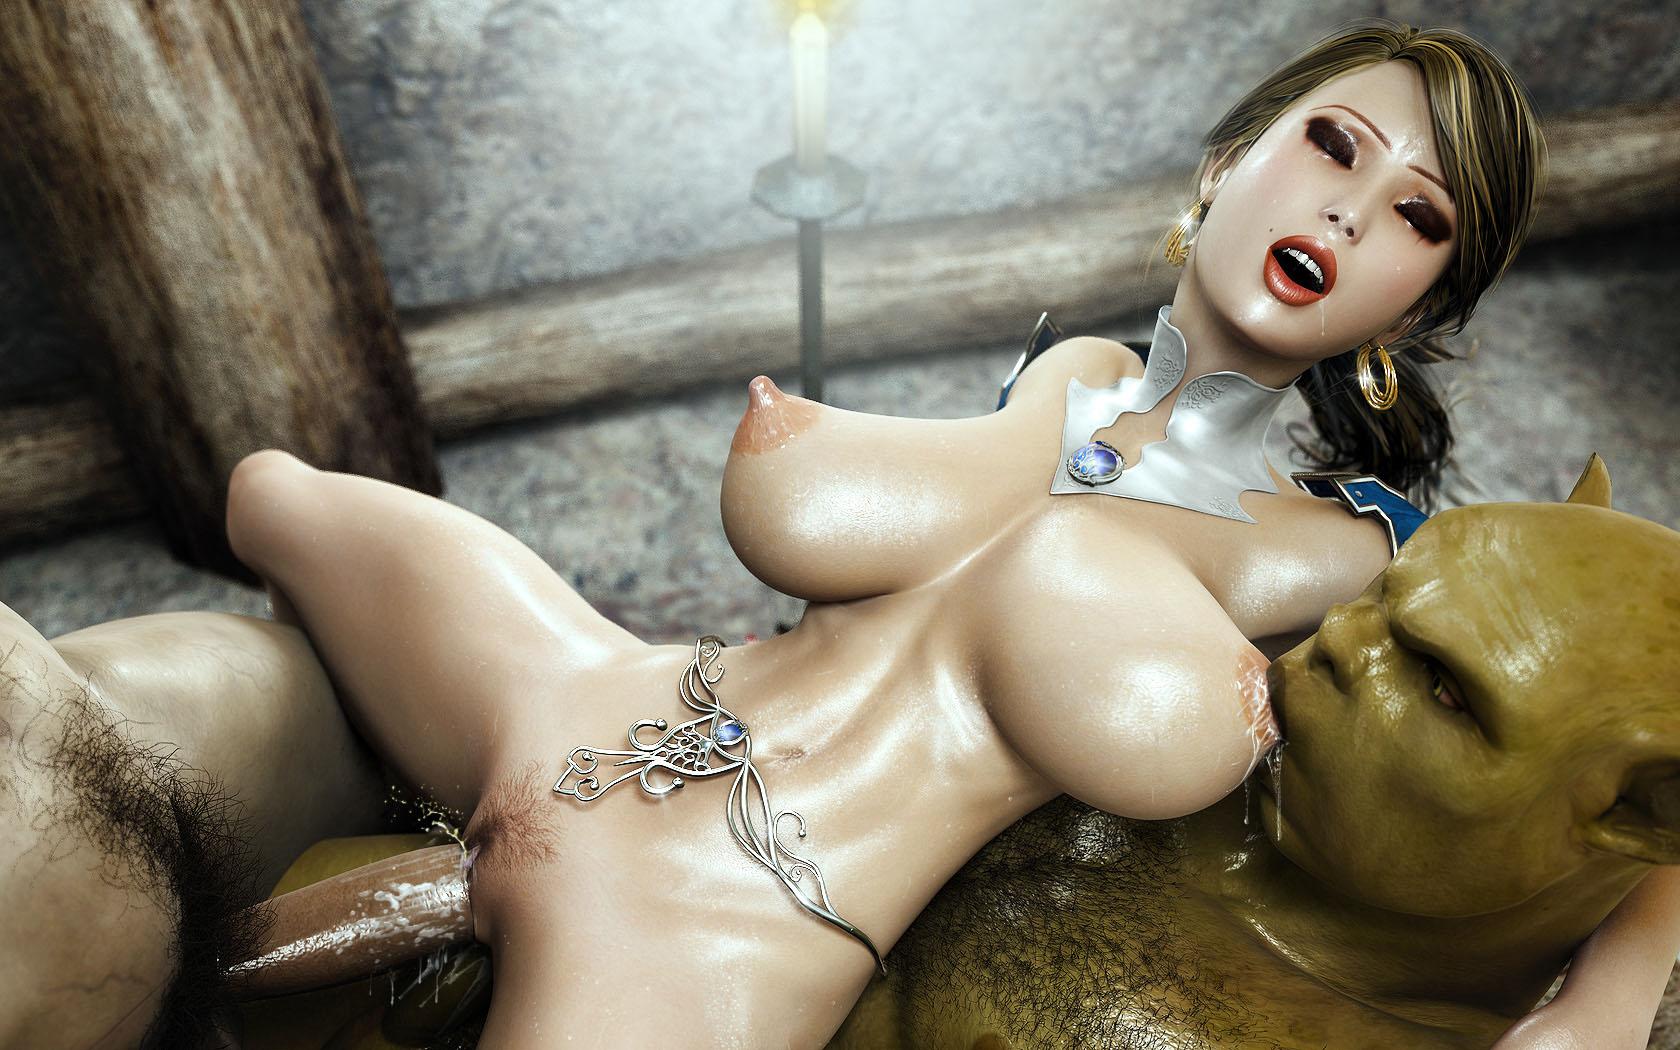 Fantasy x free porn comic